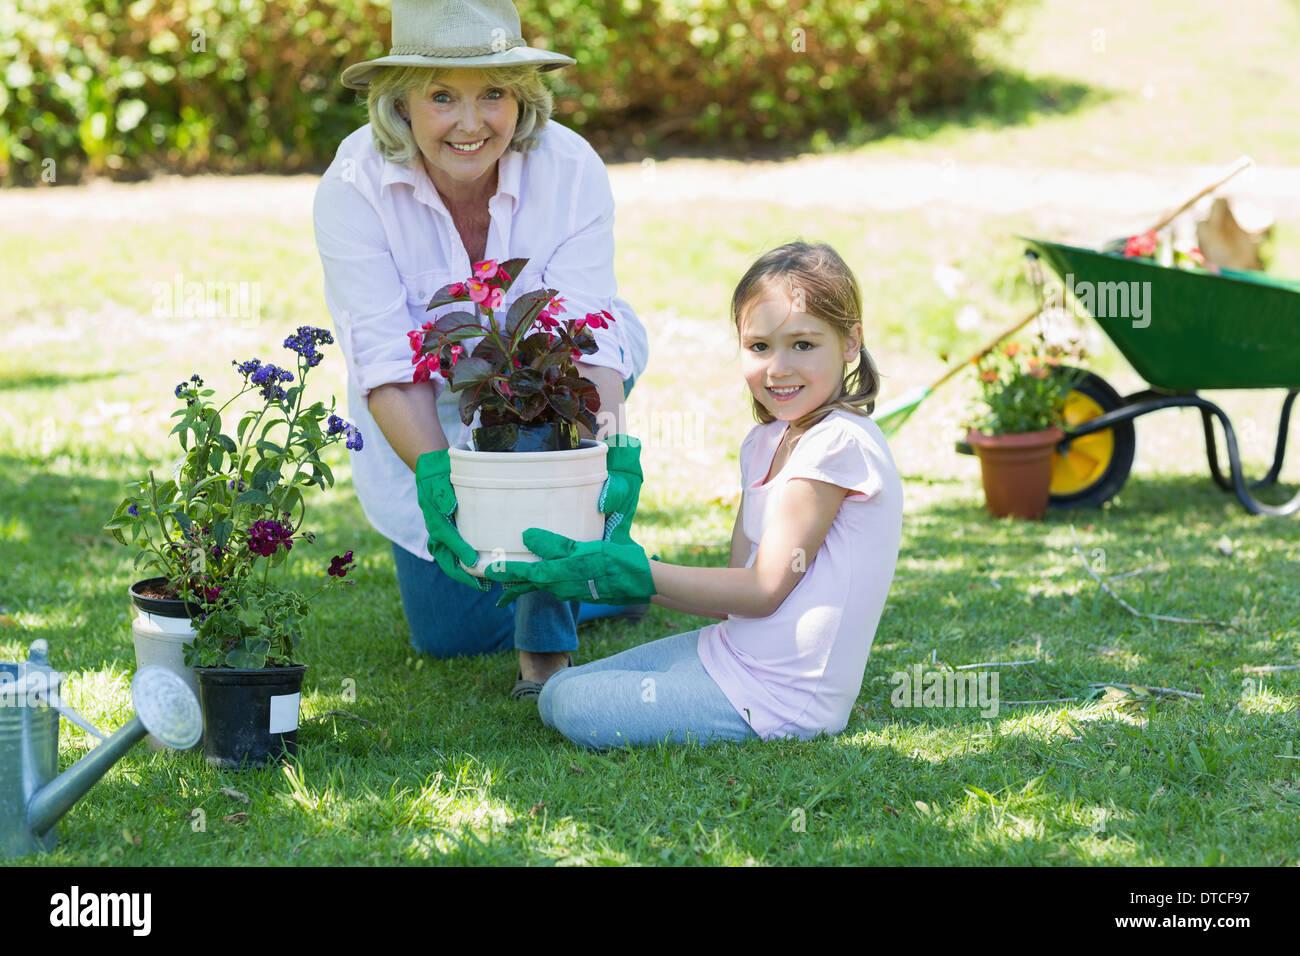 Großmutter und Enkelin engagiert bei der Gartenarbeit Stockbild